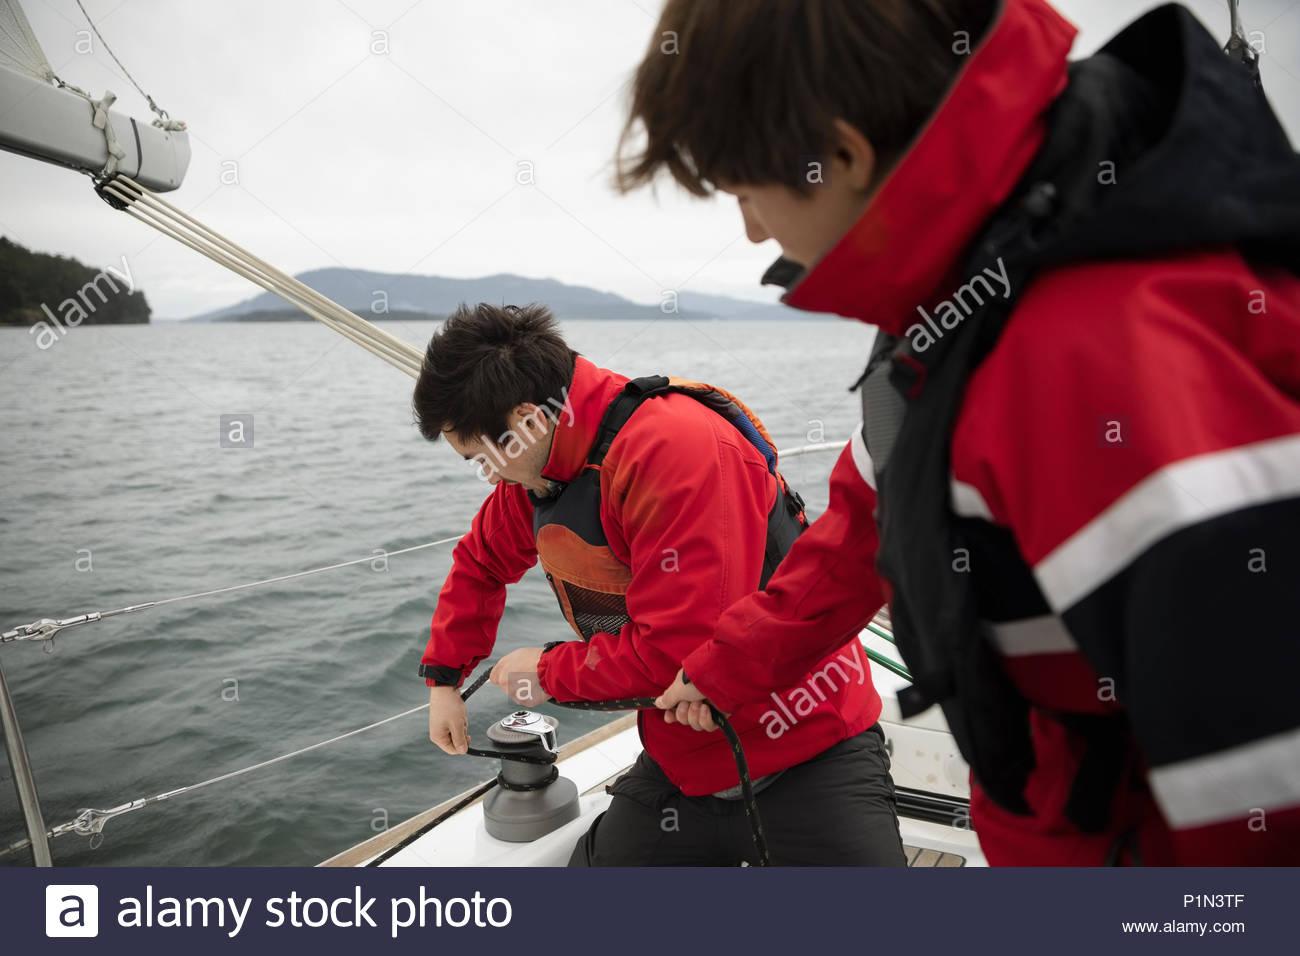 Sailing team adjusting equipment on sailboat on ocean - Stock Image